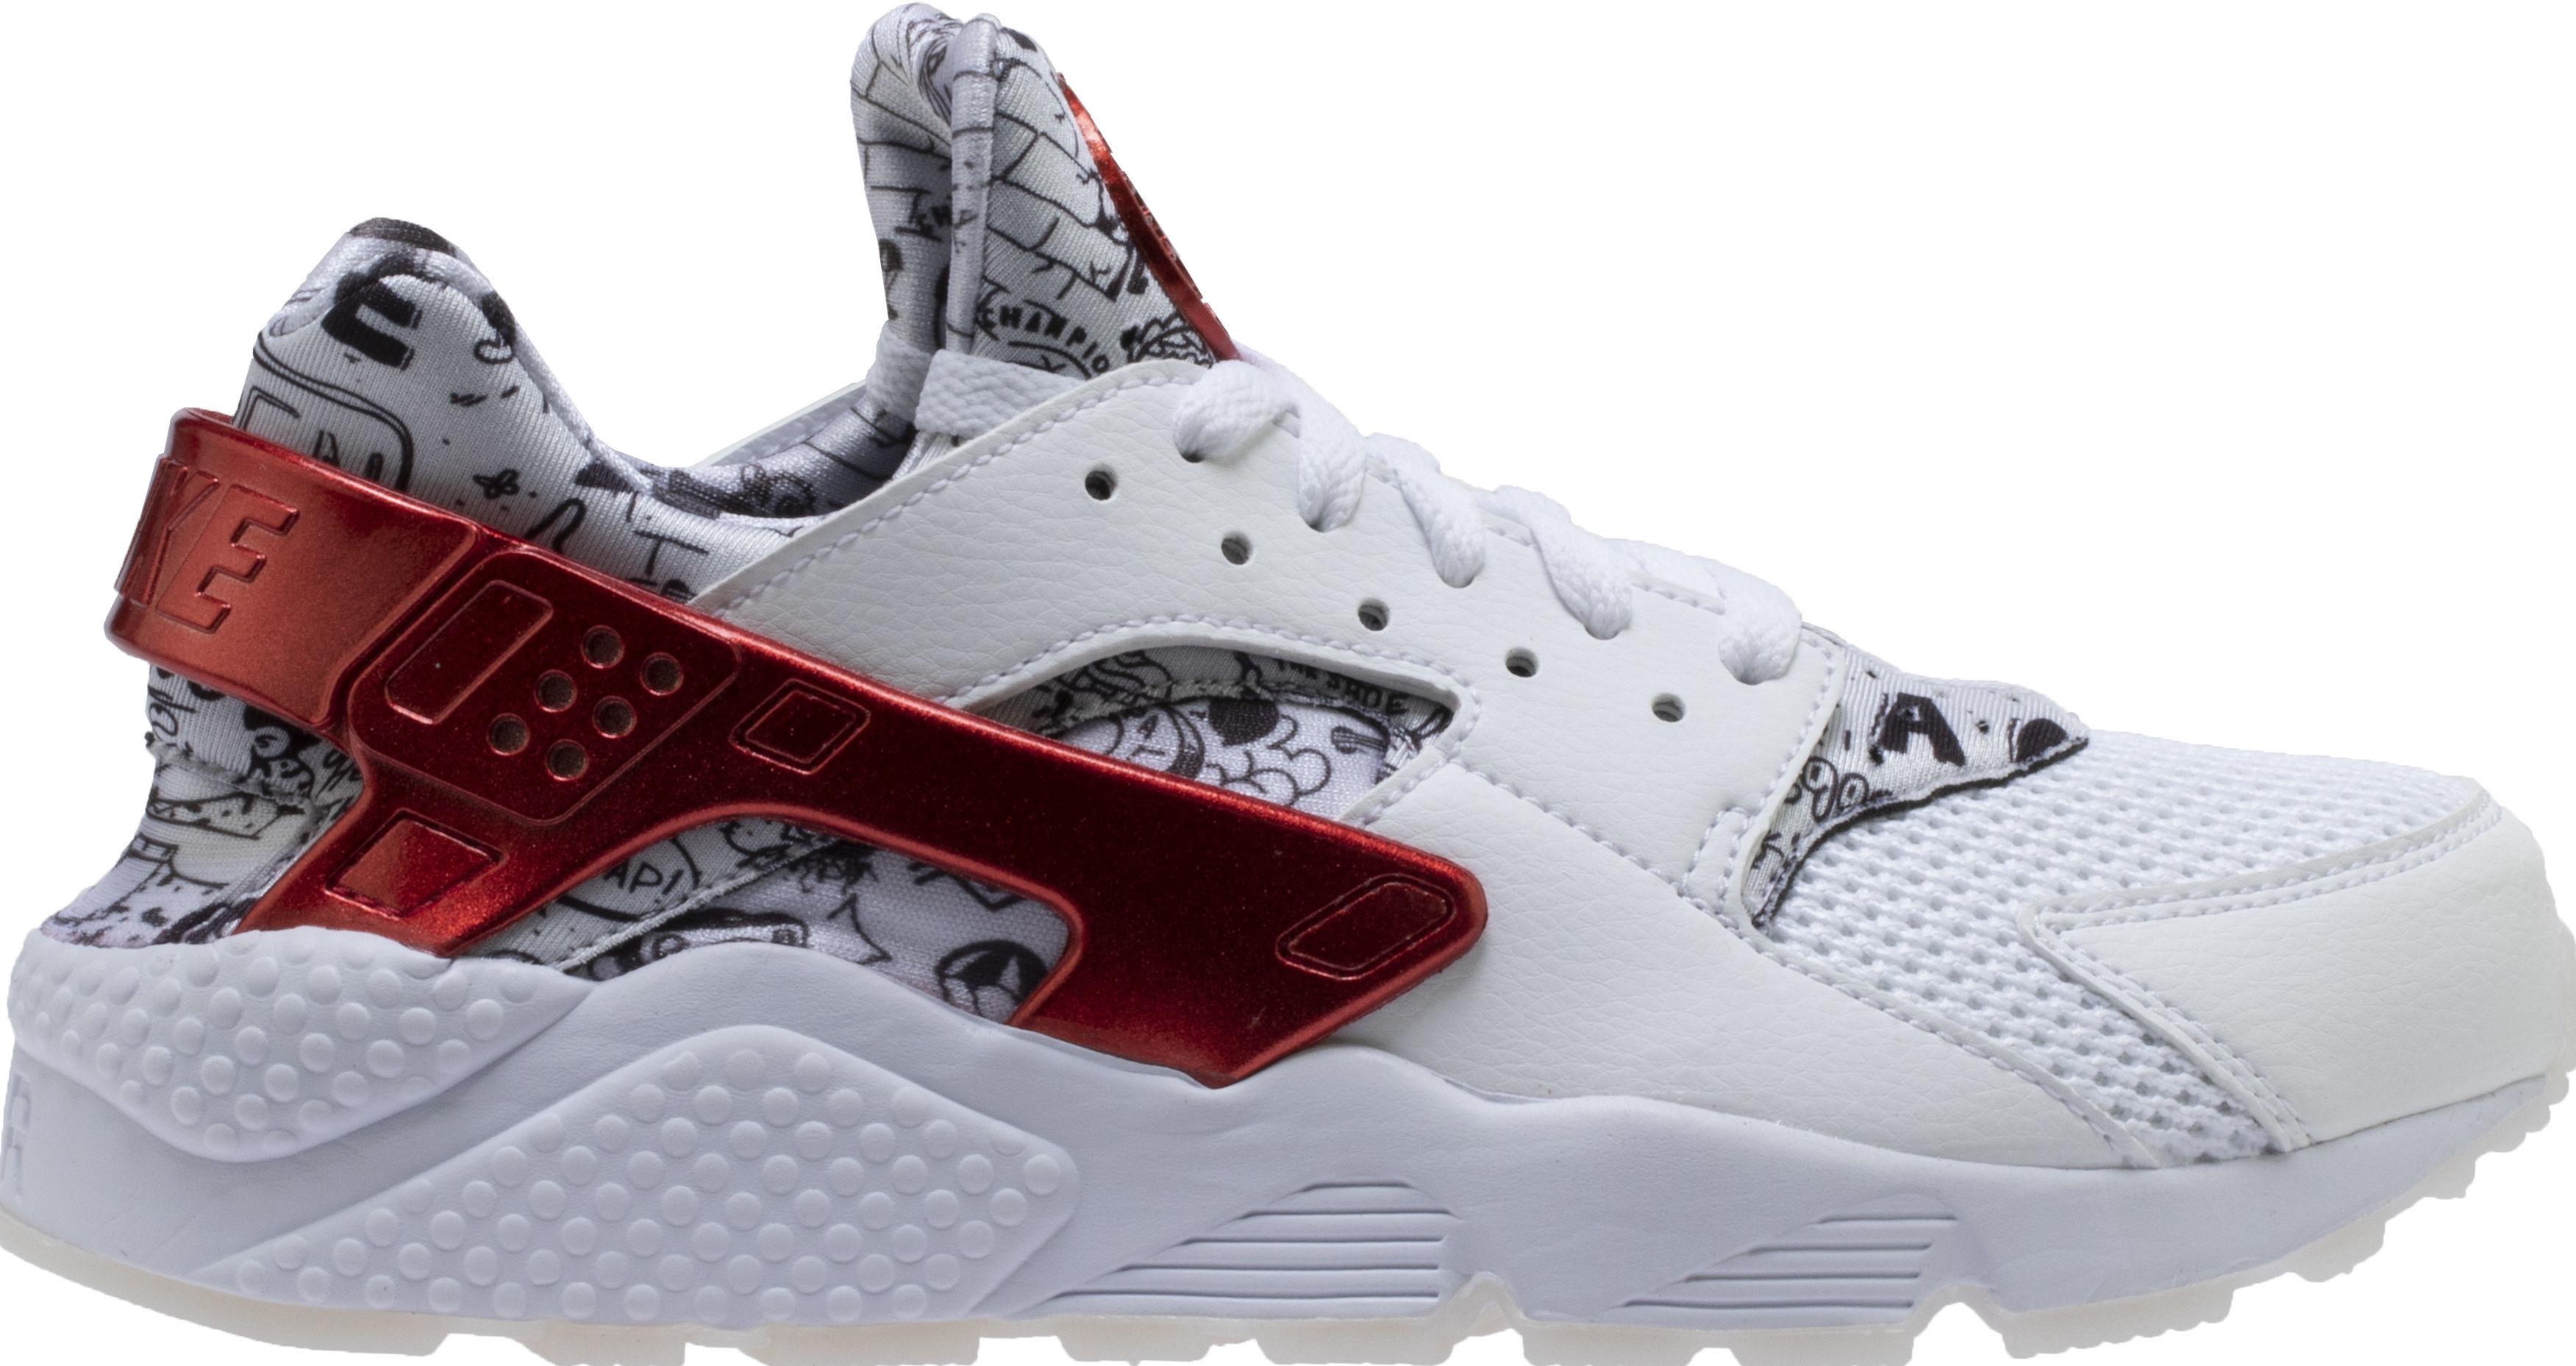 66a492addc Shoe Palace x Nike Air Huarache White/Red/Platinum 'Joonbug' AJ5578-101  Release Date | Sole Collector